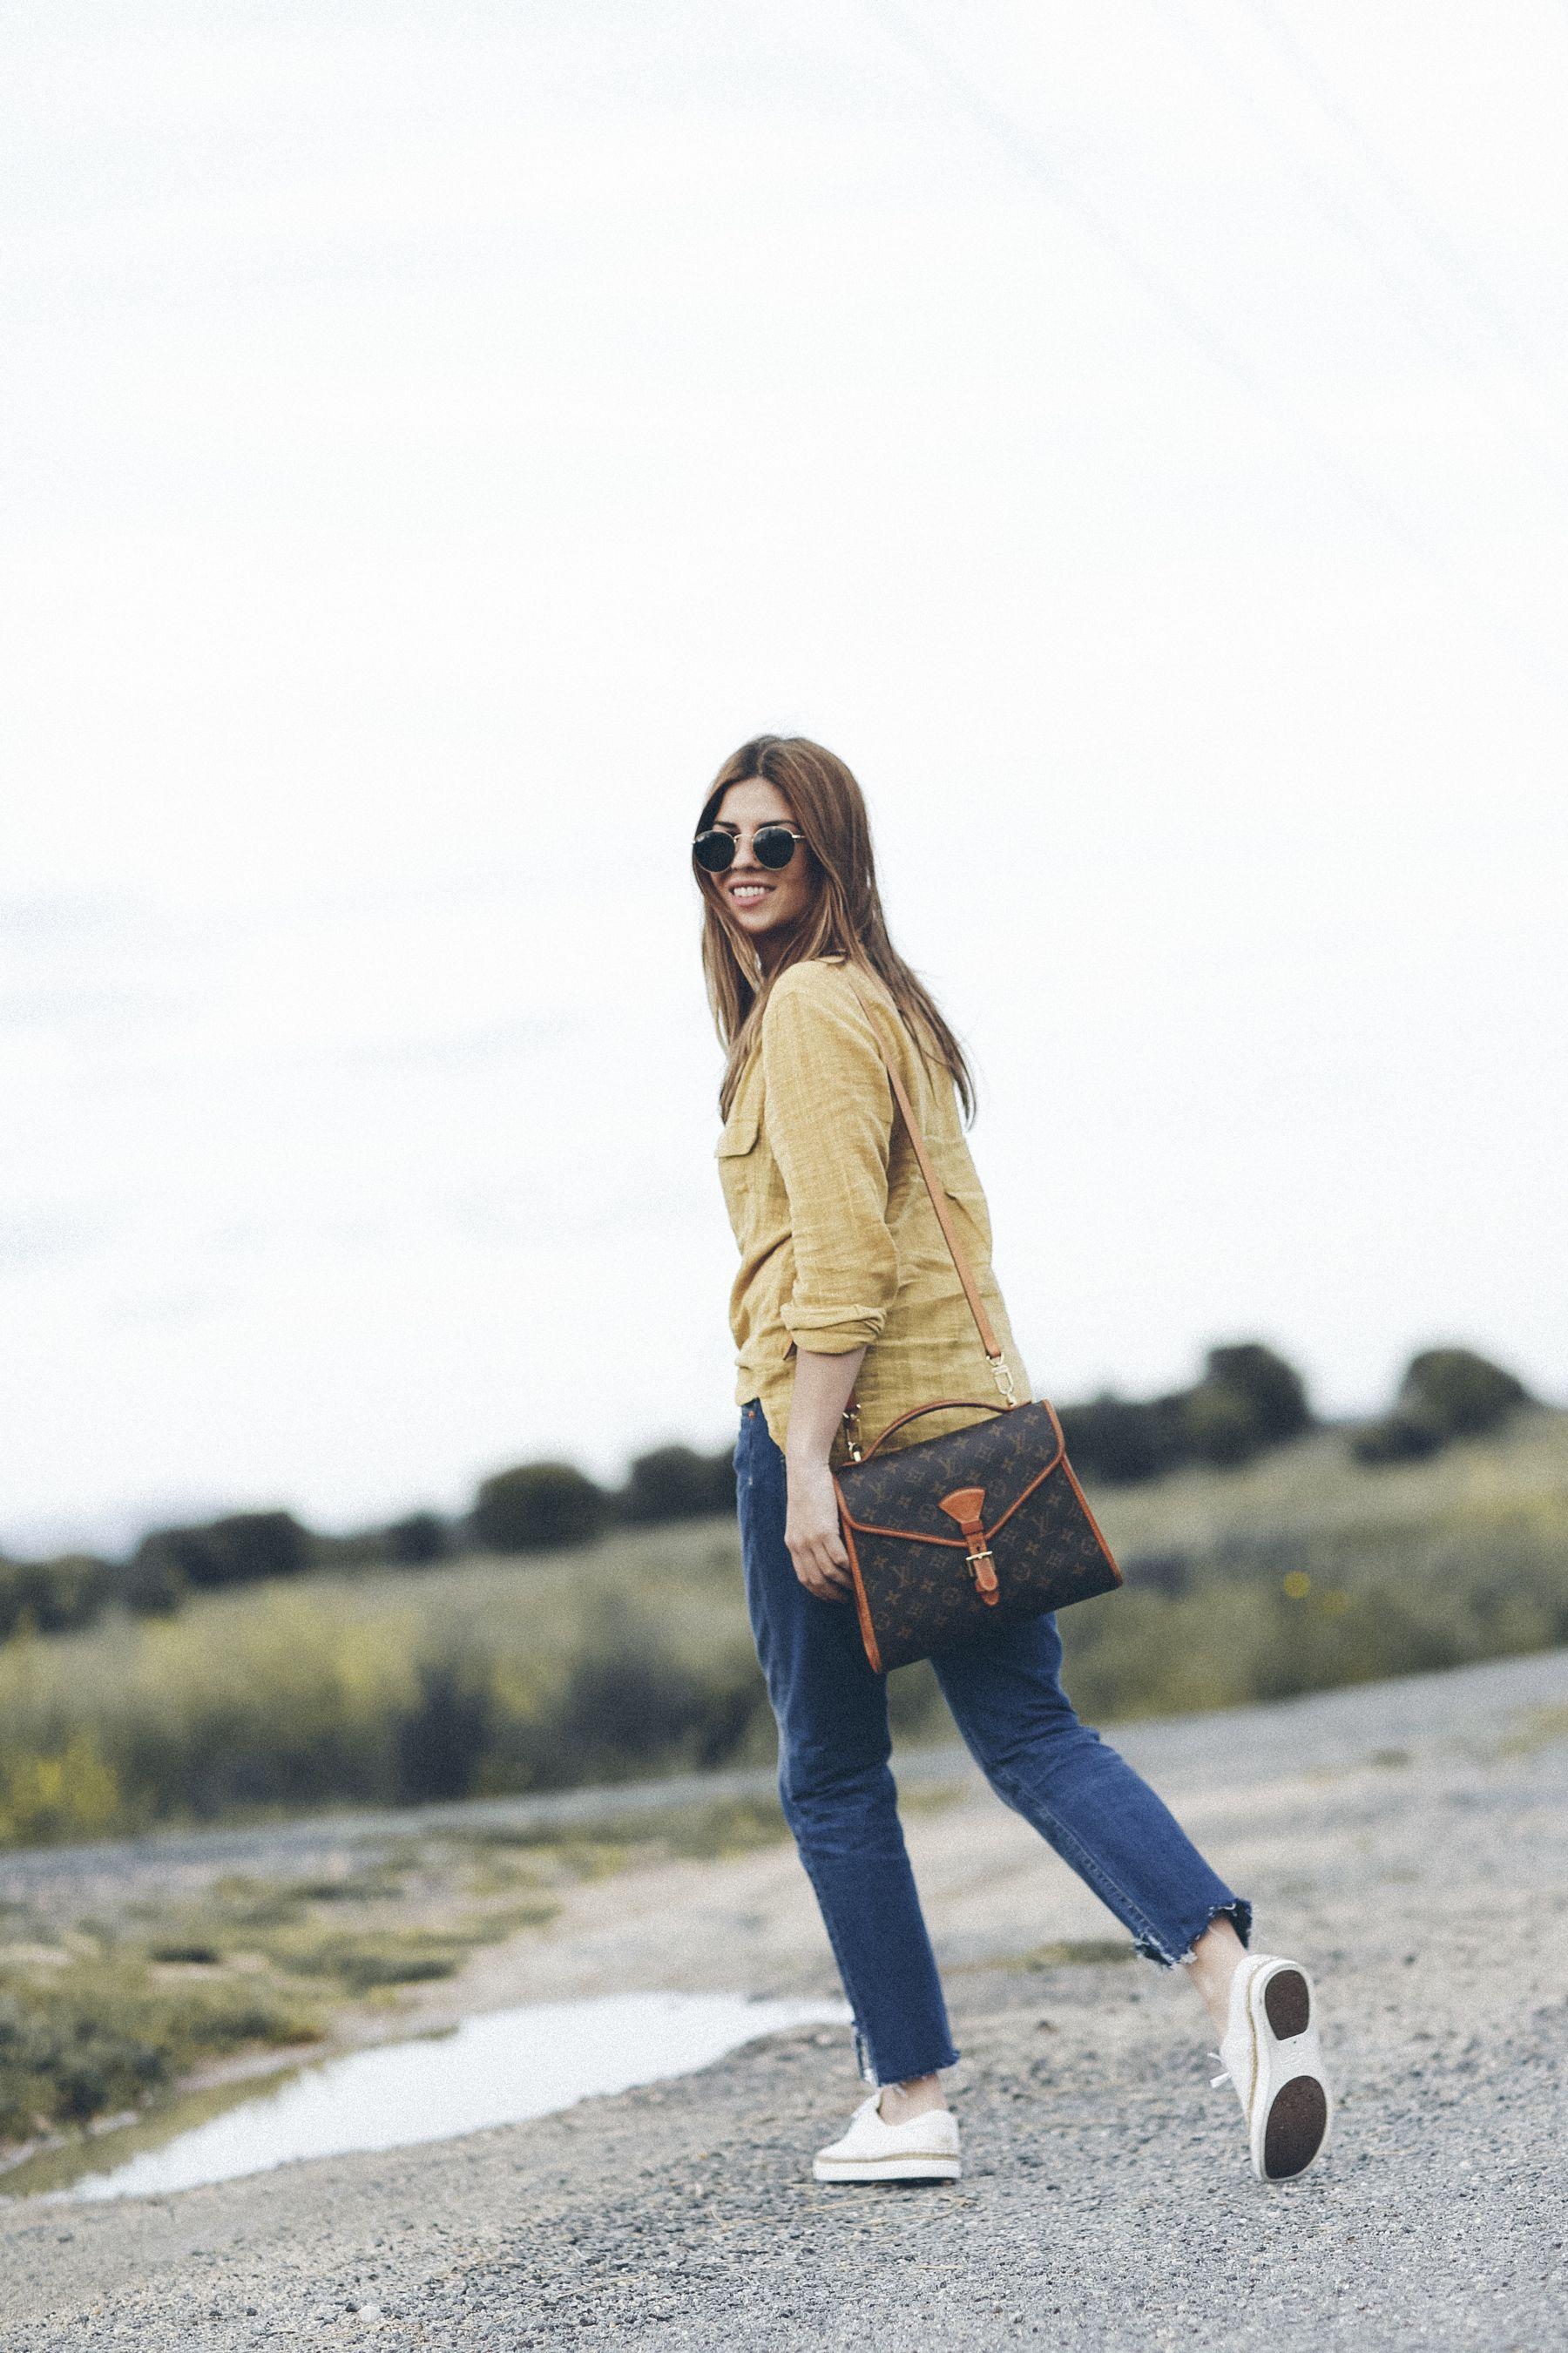 zapatillas sneakers ugg australia outfit look primavera spring camisa mango vaqueros jeans boyfriend oversize levis Rayban gafas de sol sunglasses street style trendy taste bolso bag louis vuitton _5